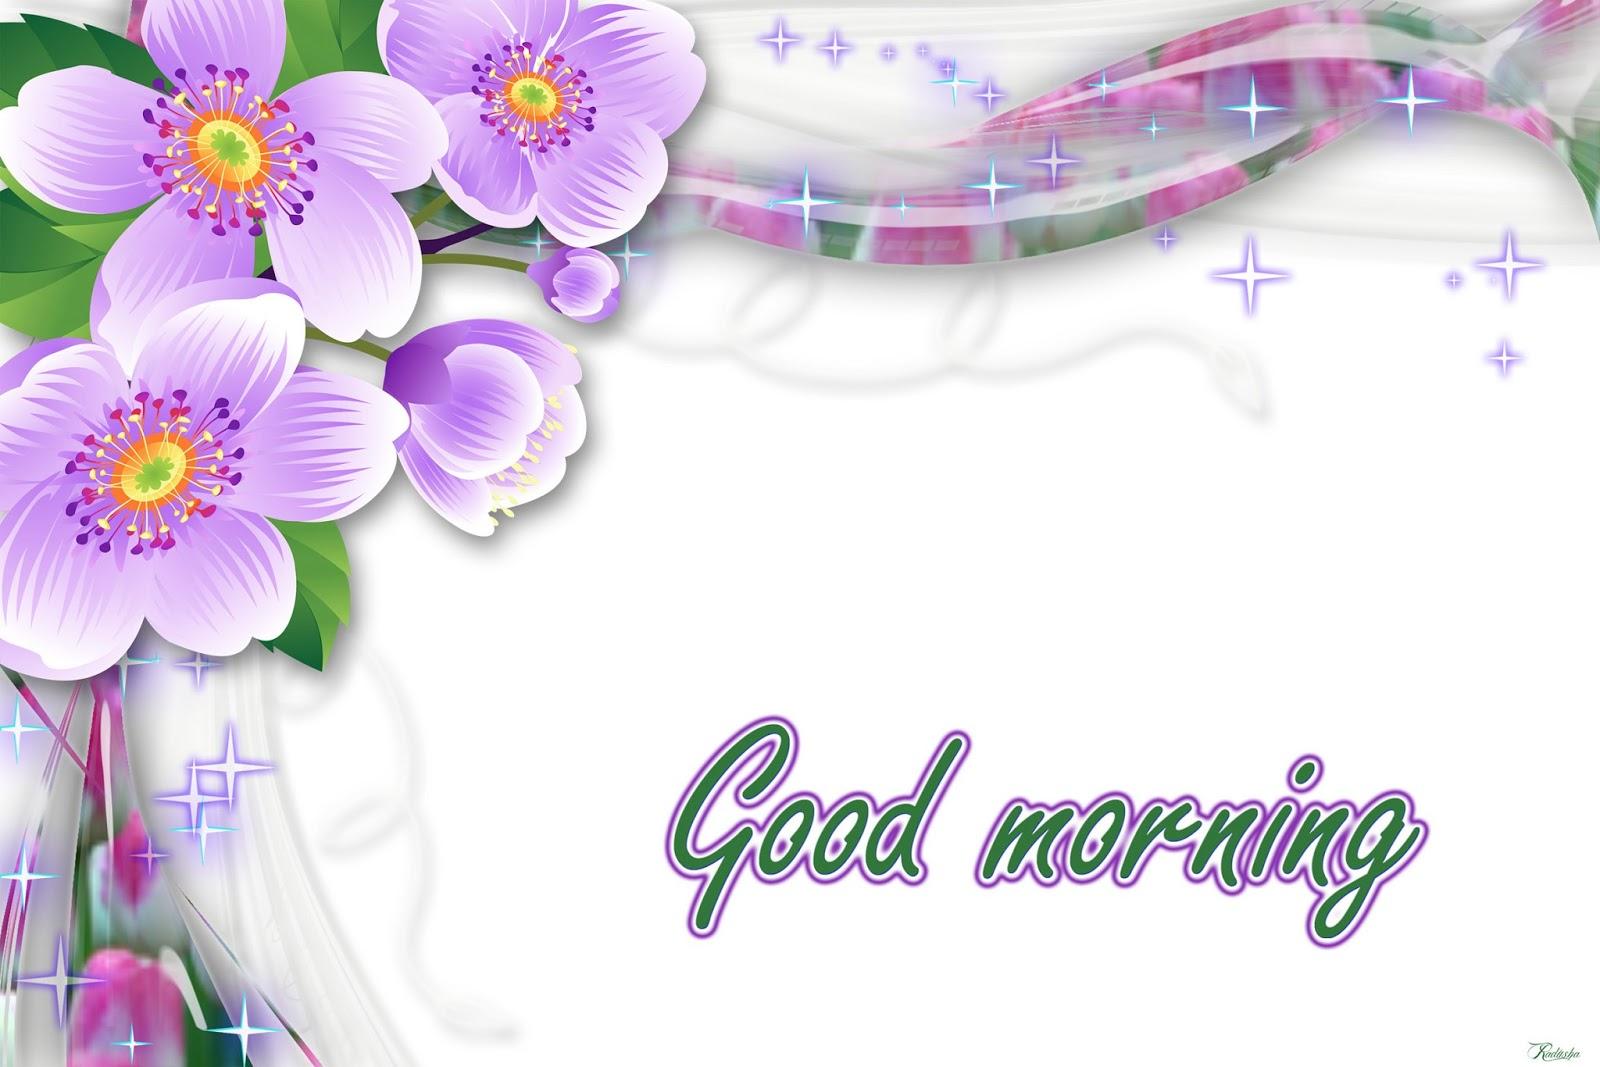 Khushi For Life Wonderful Good Morning Greetings Morning Wishes